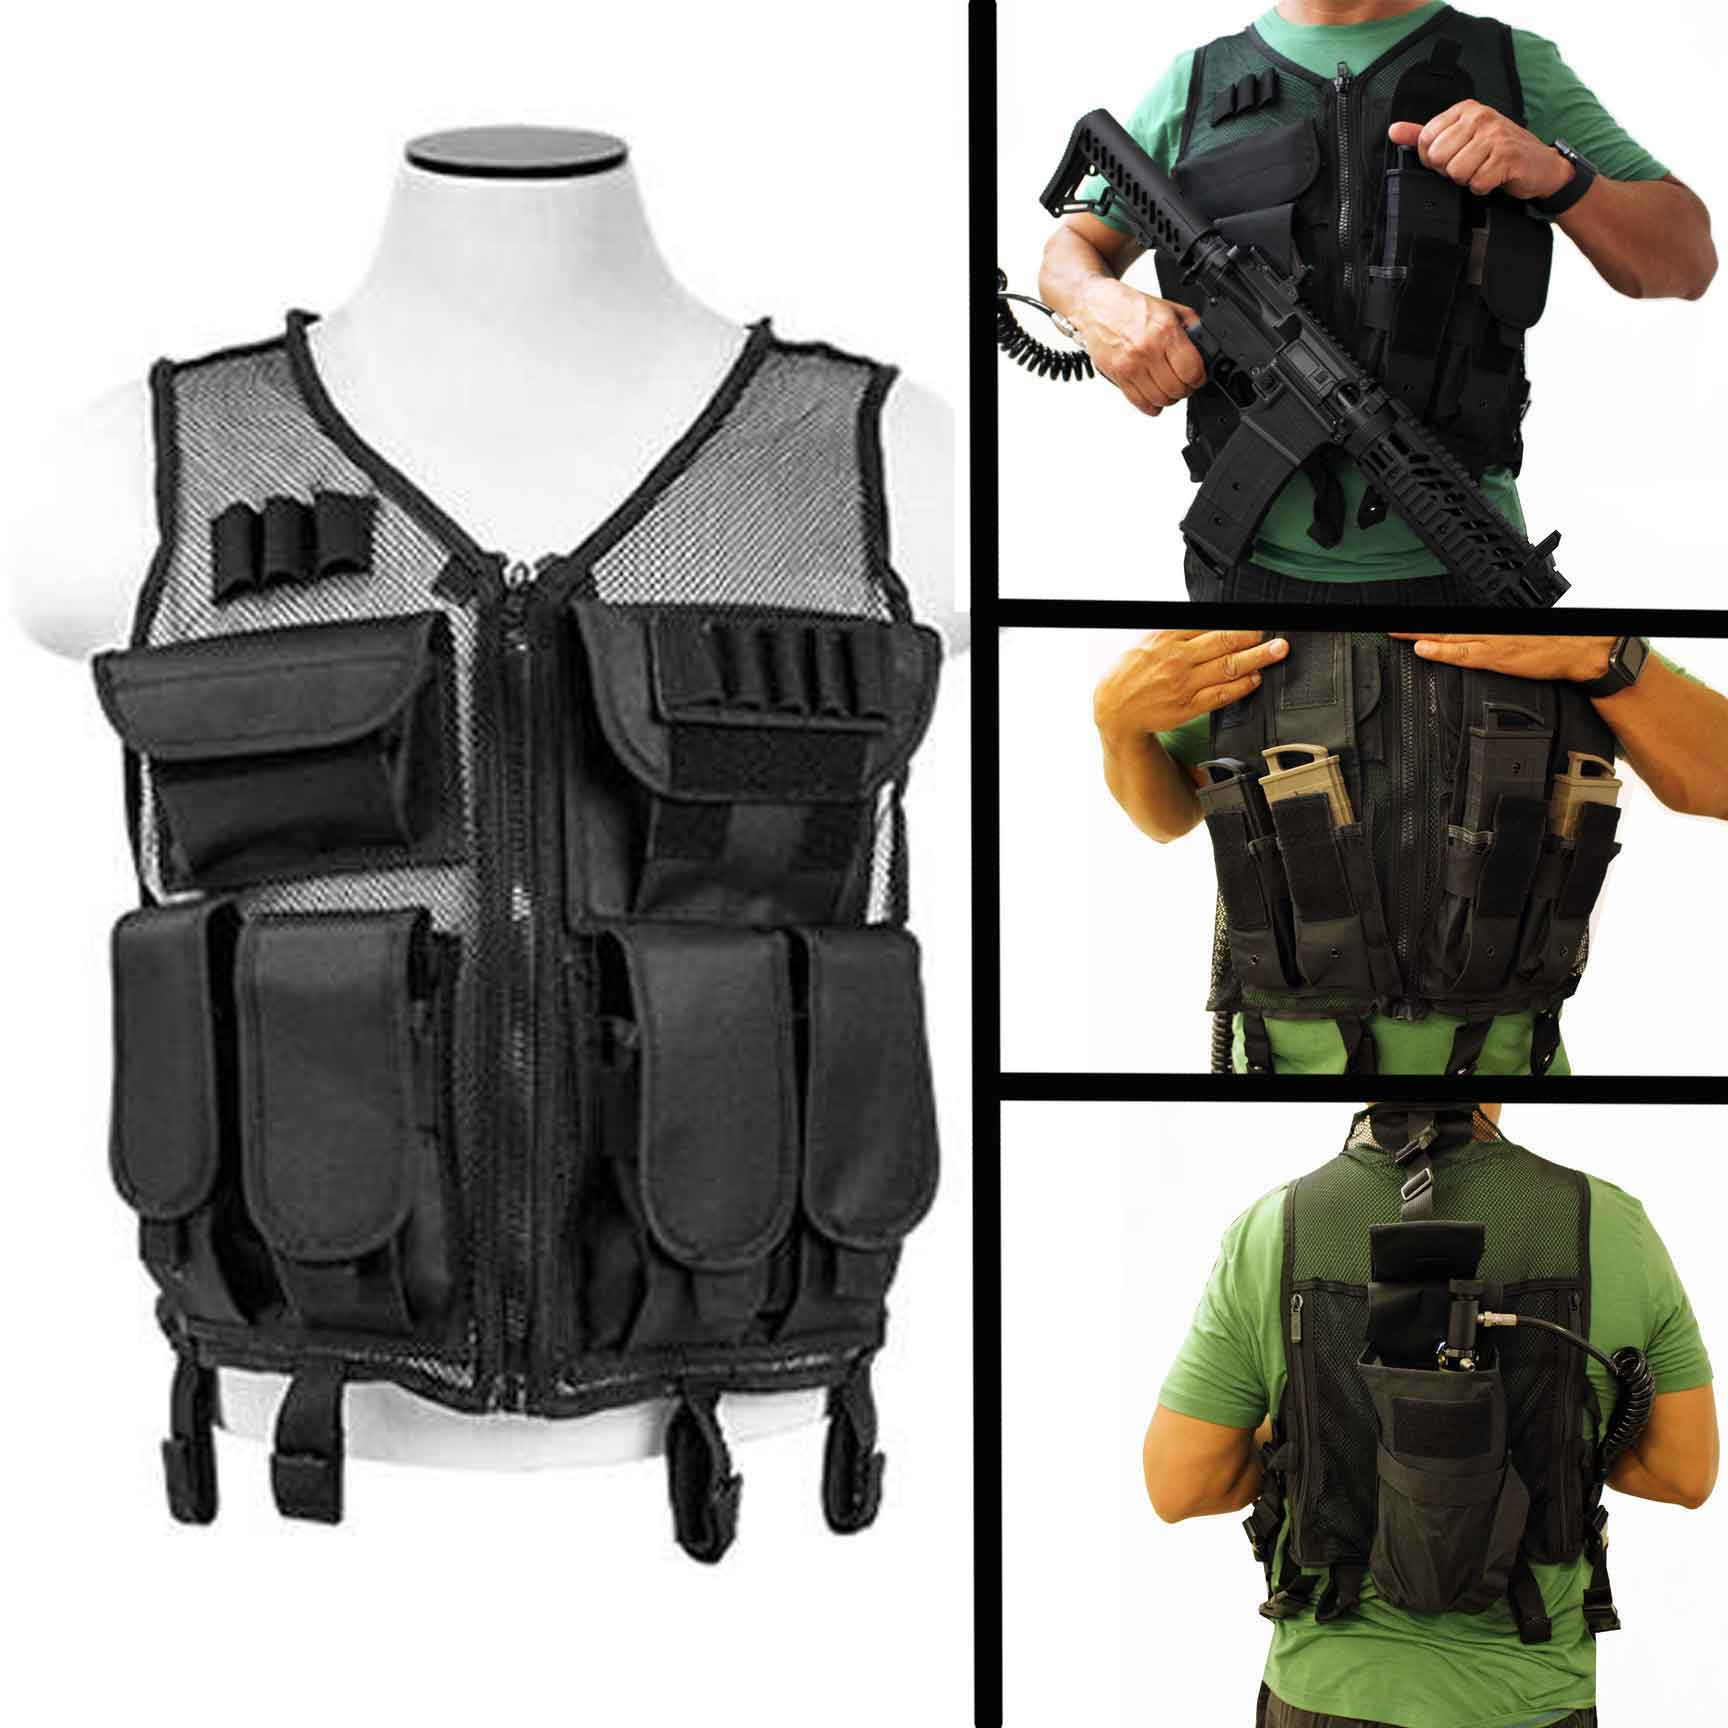 Paintball mesh vest Tippmann TMC Mag holder black. by Trinity